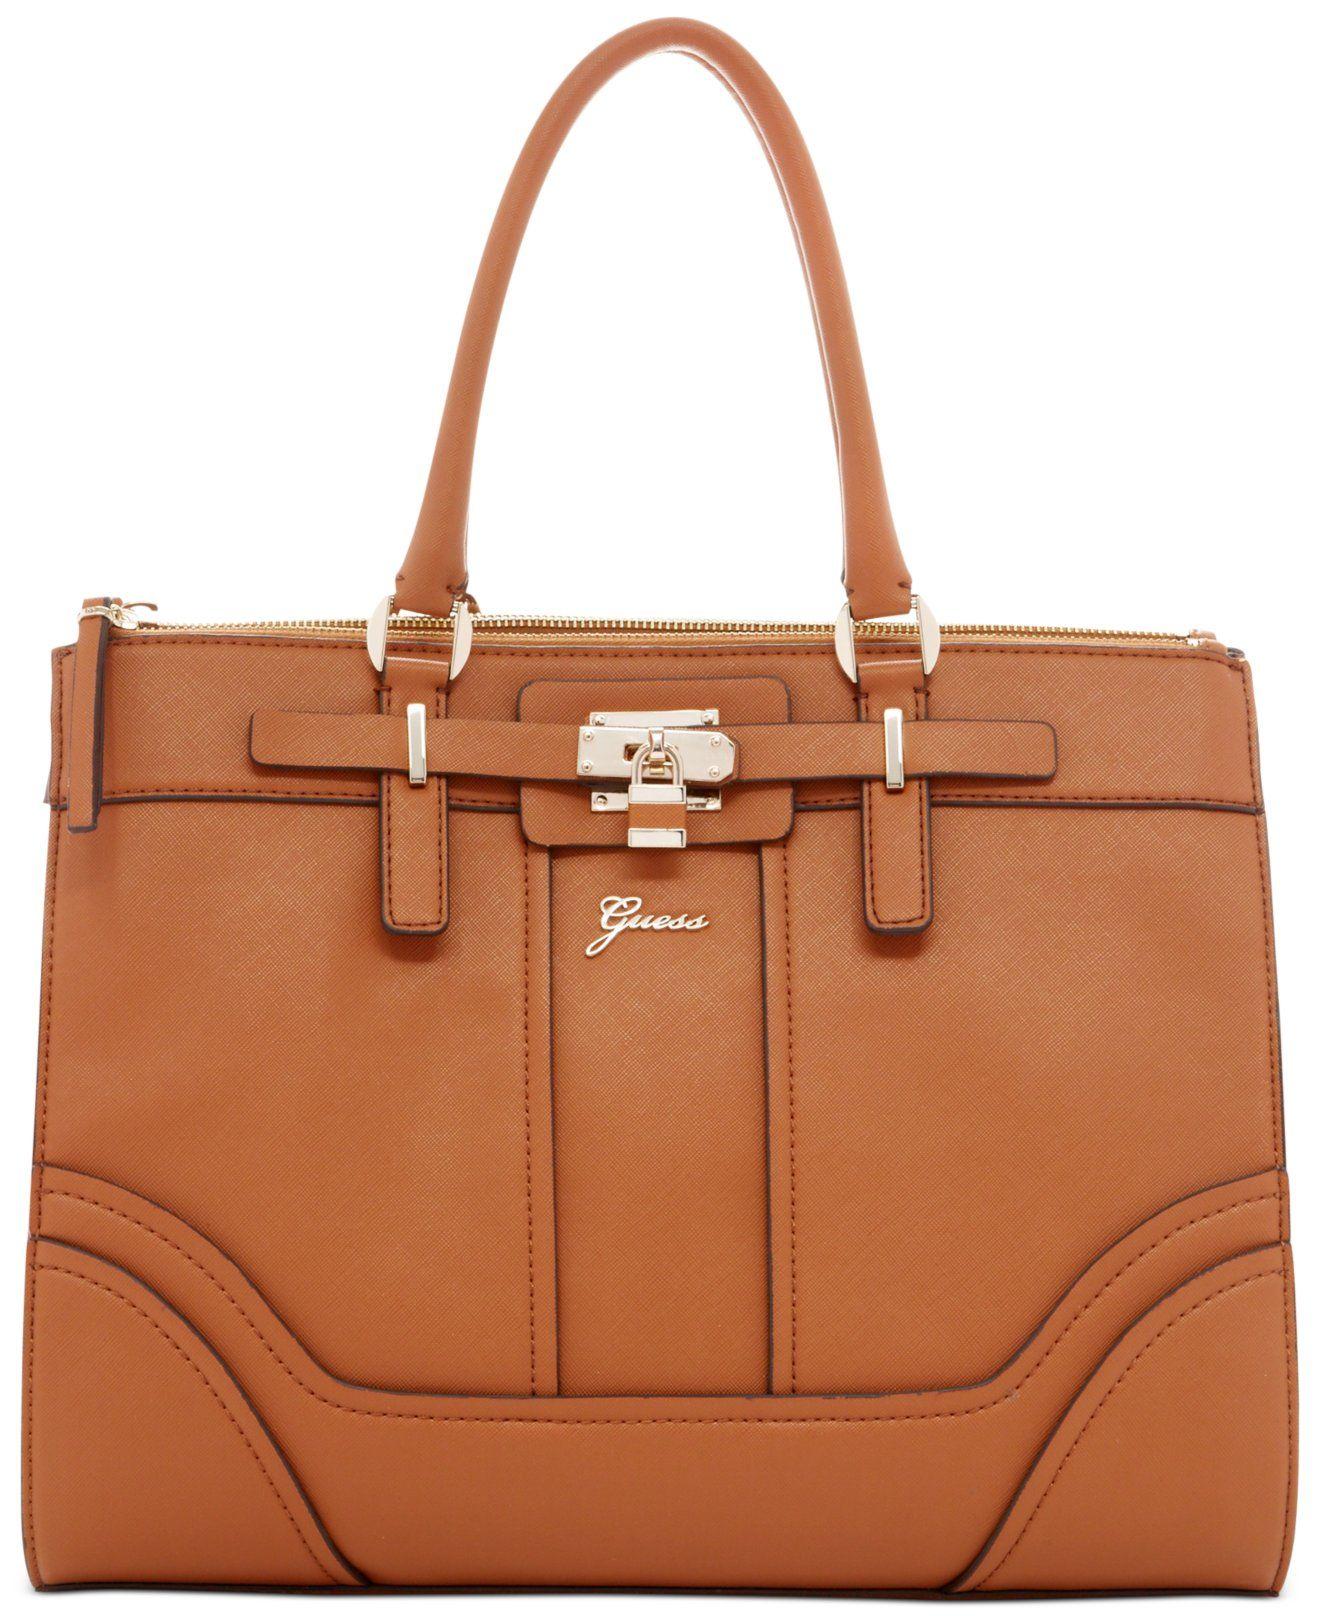 GUESS Greyson Status Carryall Saffiano - Tote Bags - Handbags   Accessories  - Macy s b0f1d0b2f9142